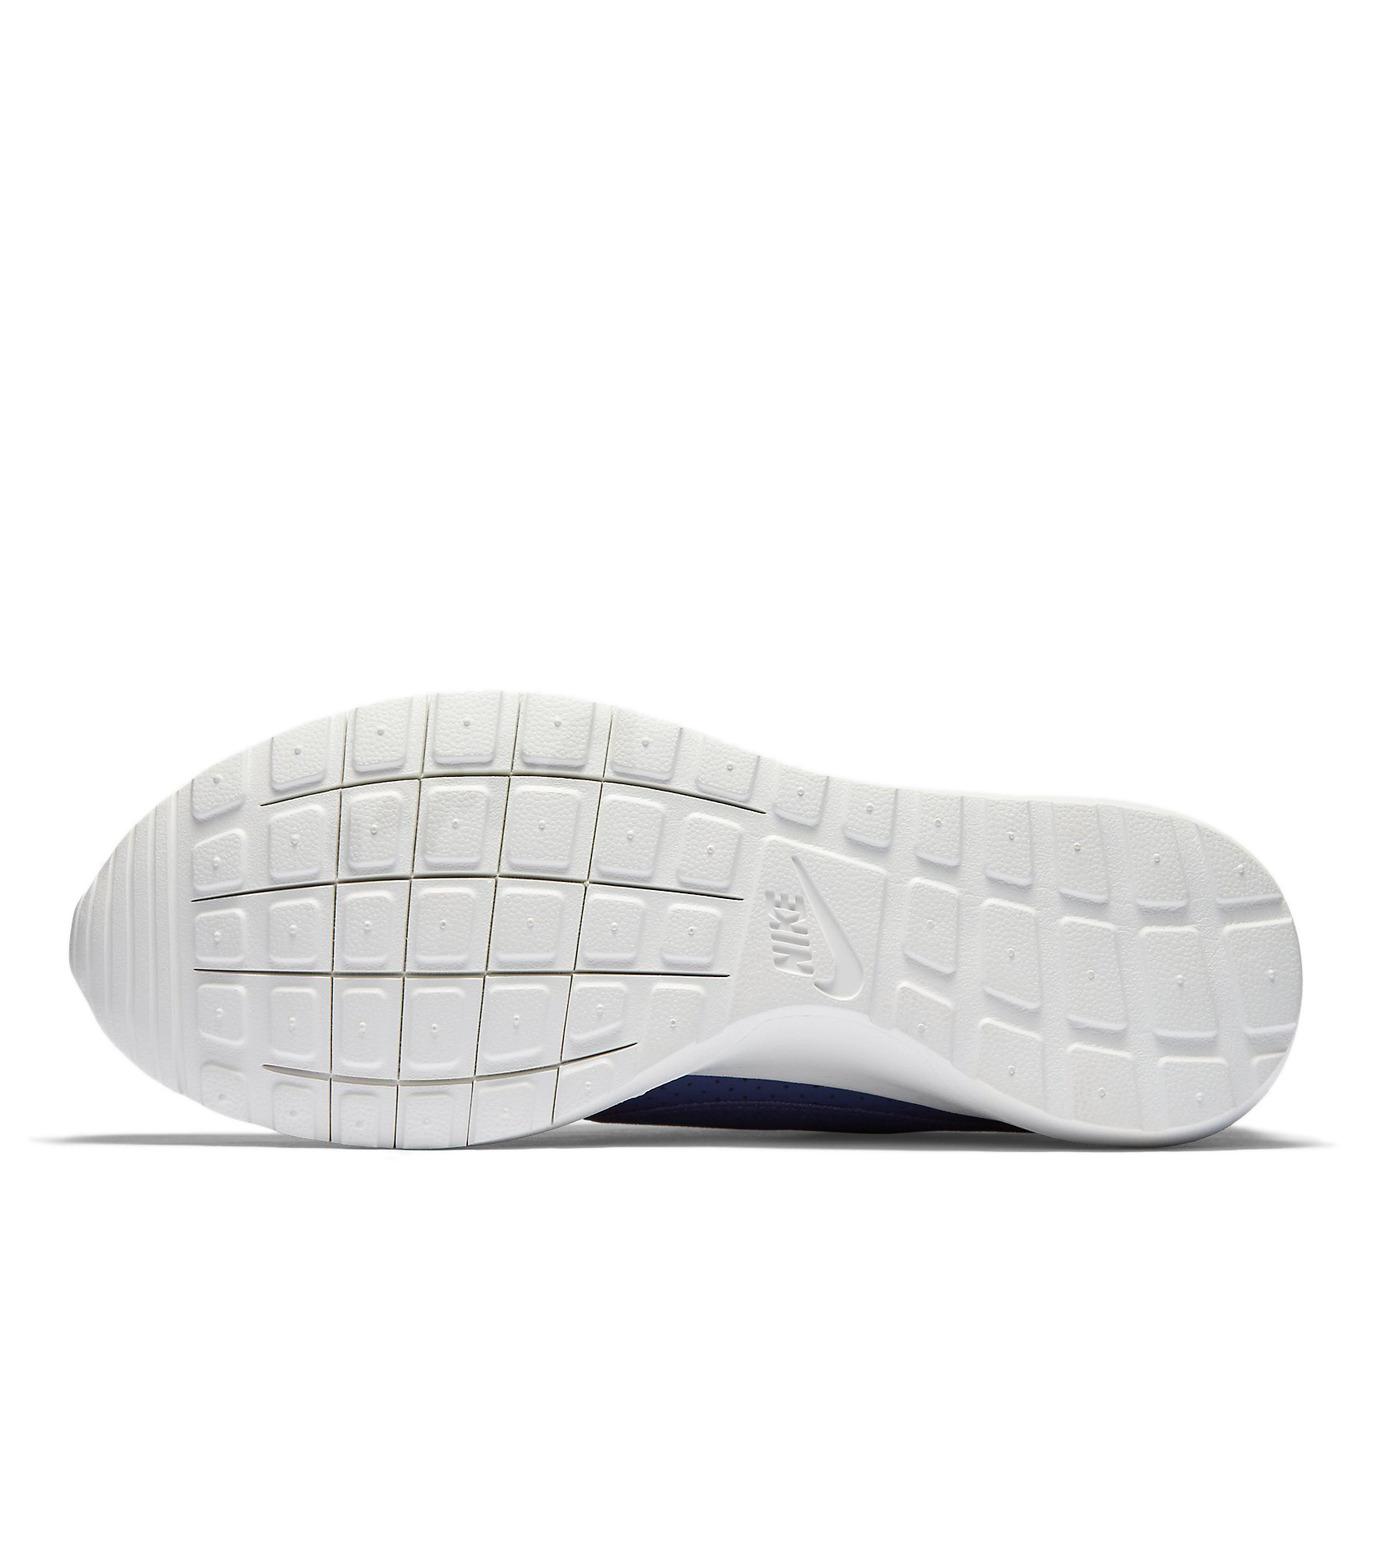 NIKE(ナイキ)のW ROSHE CORTEZ NM-WHITE(シューズ/shoes)-833804-101-4 拡大詳細画像2